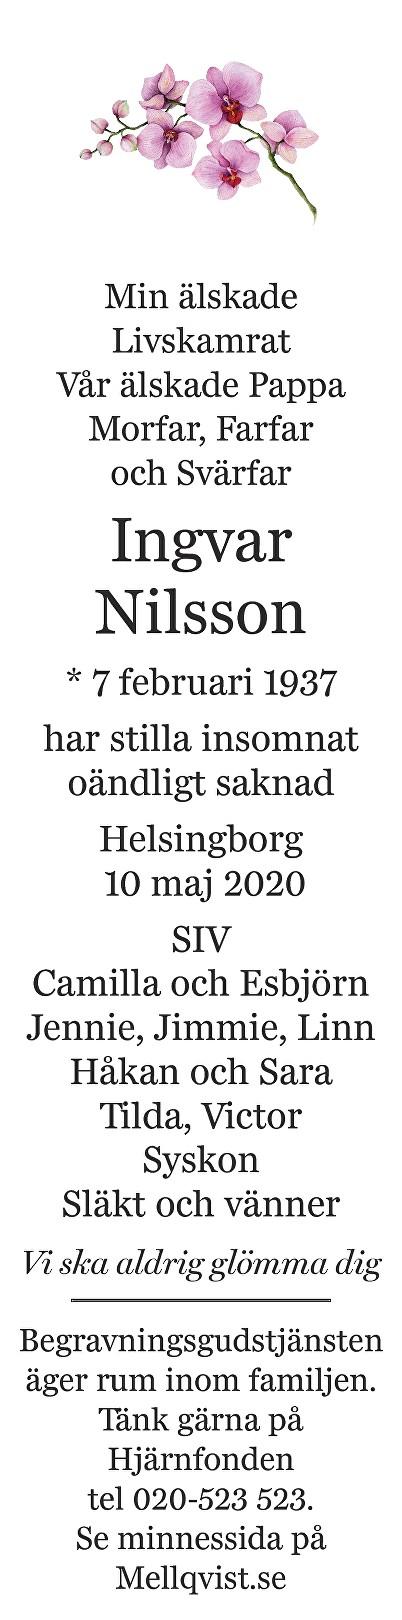 Ingvar Nilsson Death notice